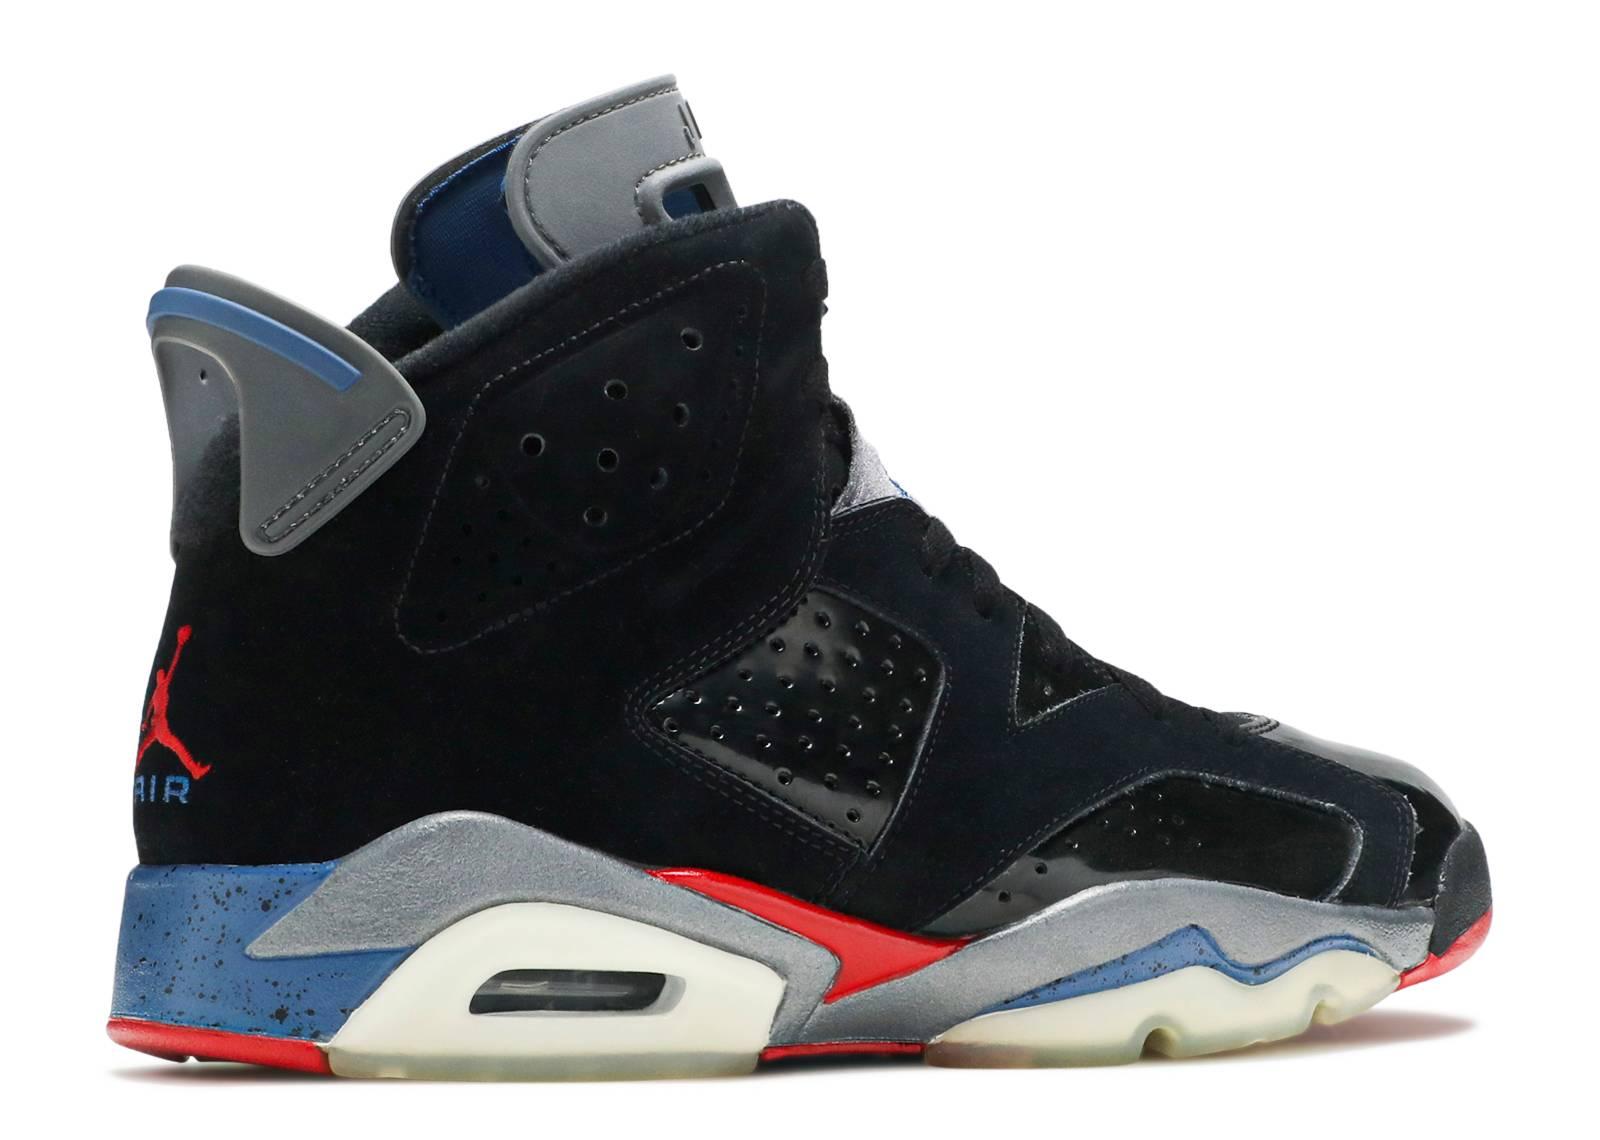 a7e7b79d215 netherlands air jordan retro 6 black red blue 8a78c f984c